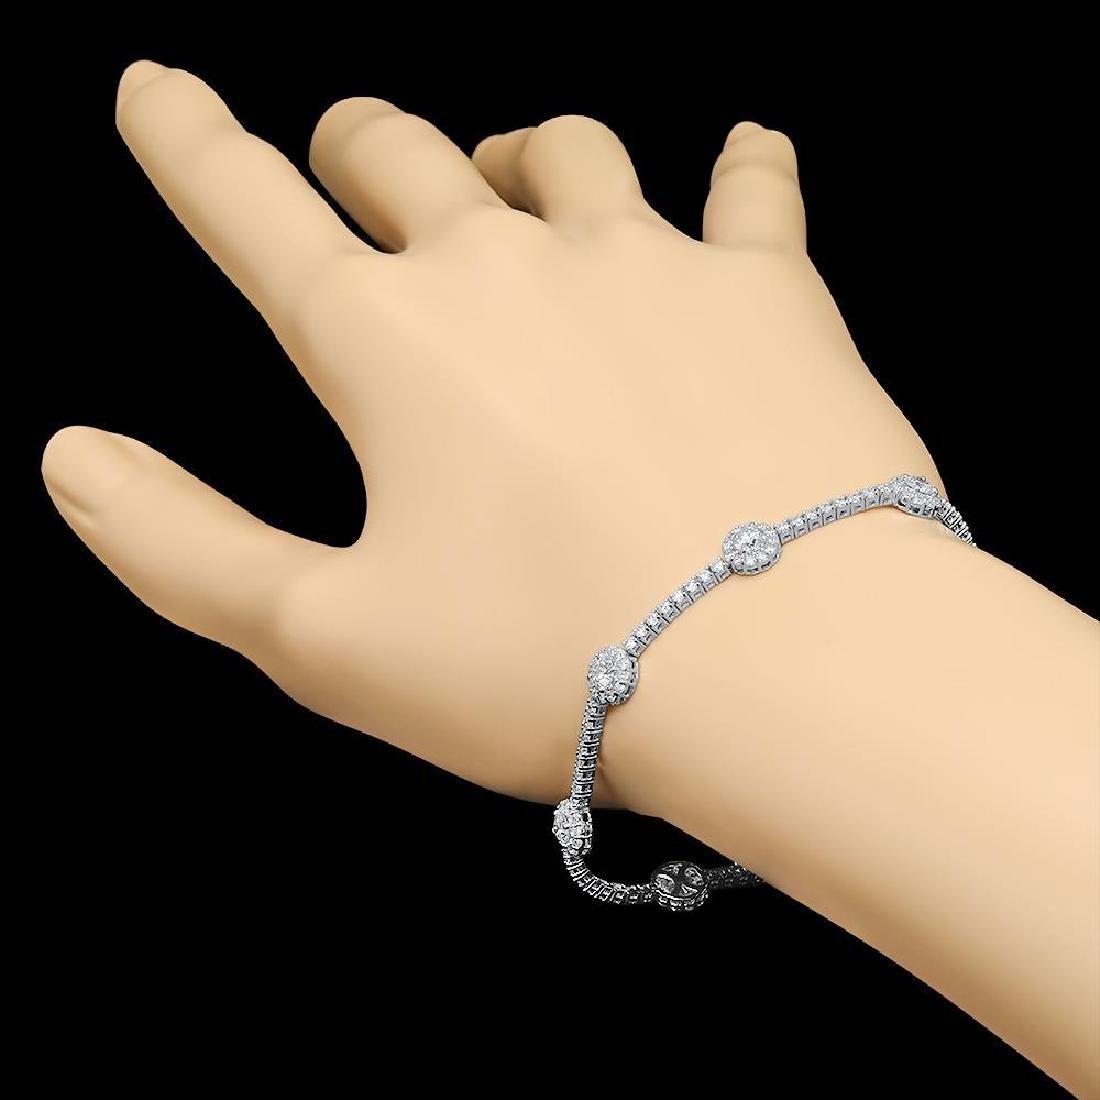 18k White Gold 5.95ct Diamond Bracelet - 2